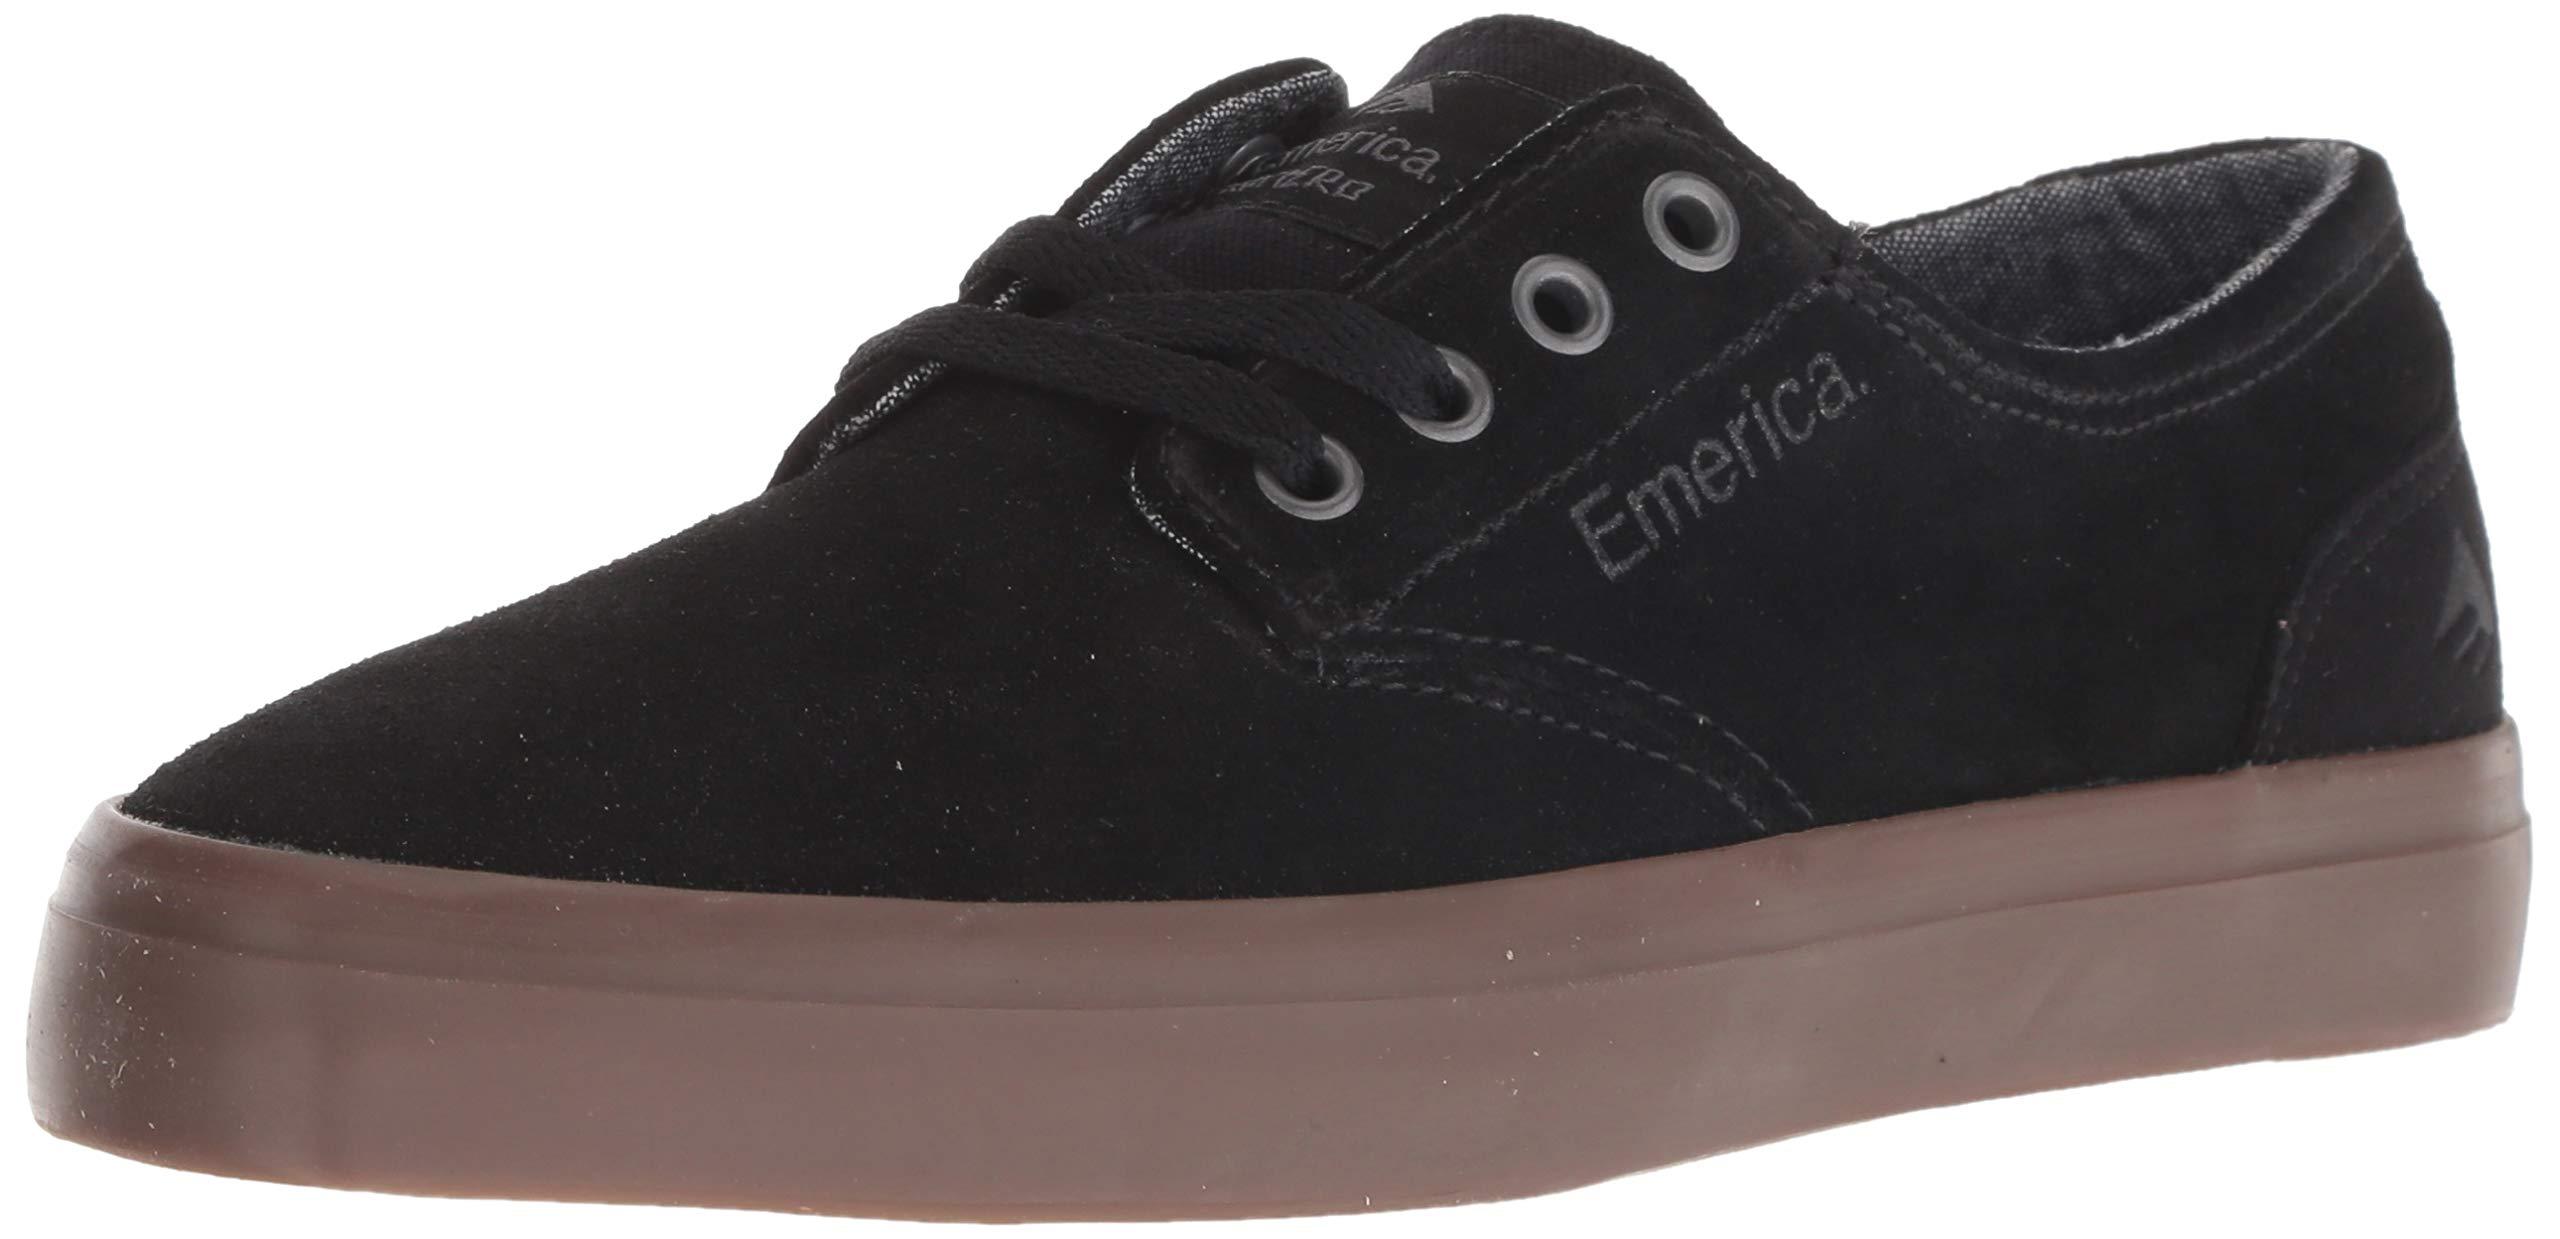 Emerica Boys' The Romero Laced Youth Skate Shoe, Black/Gum, 4c Medium US Big Kid